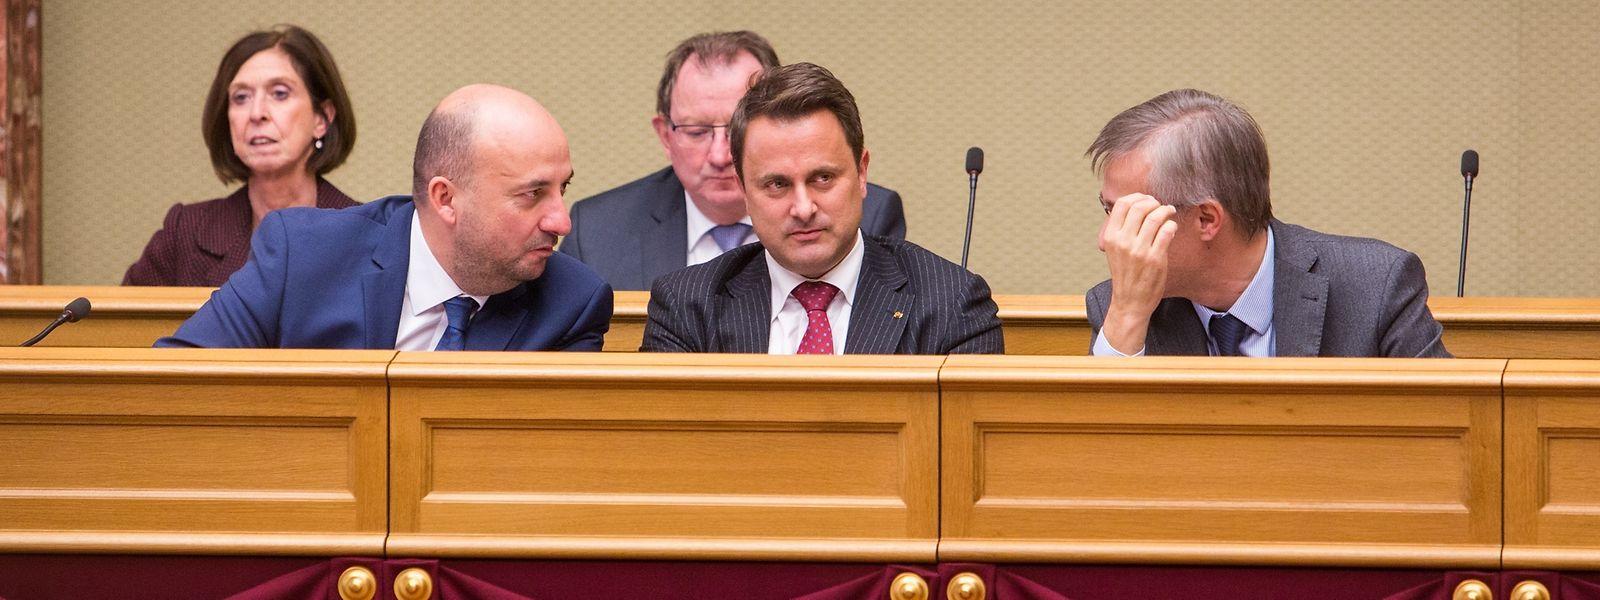 Etienne Schneider, Xavier Bettel e Felix Braz